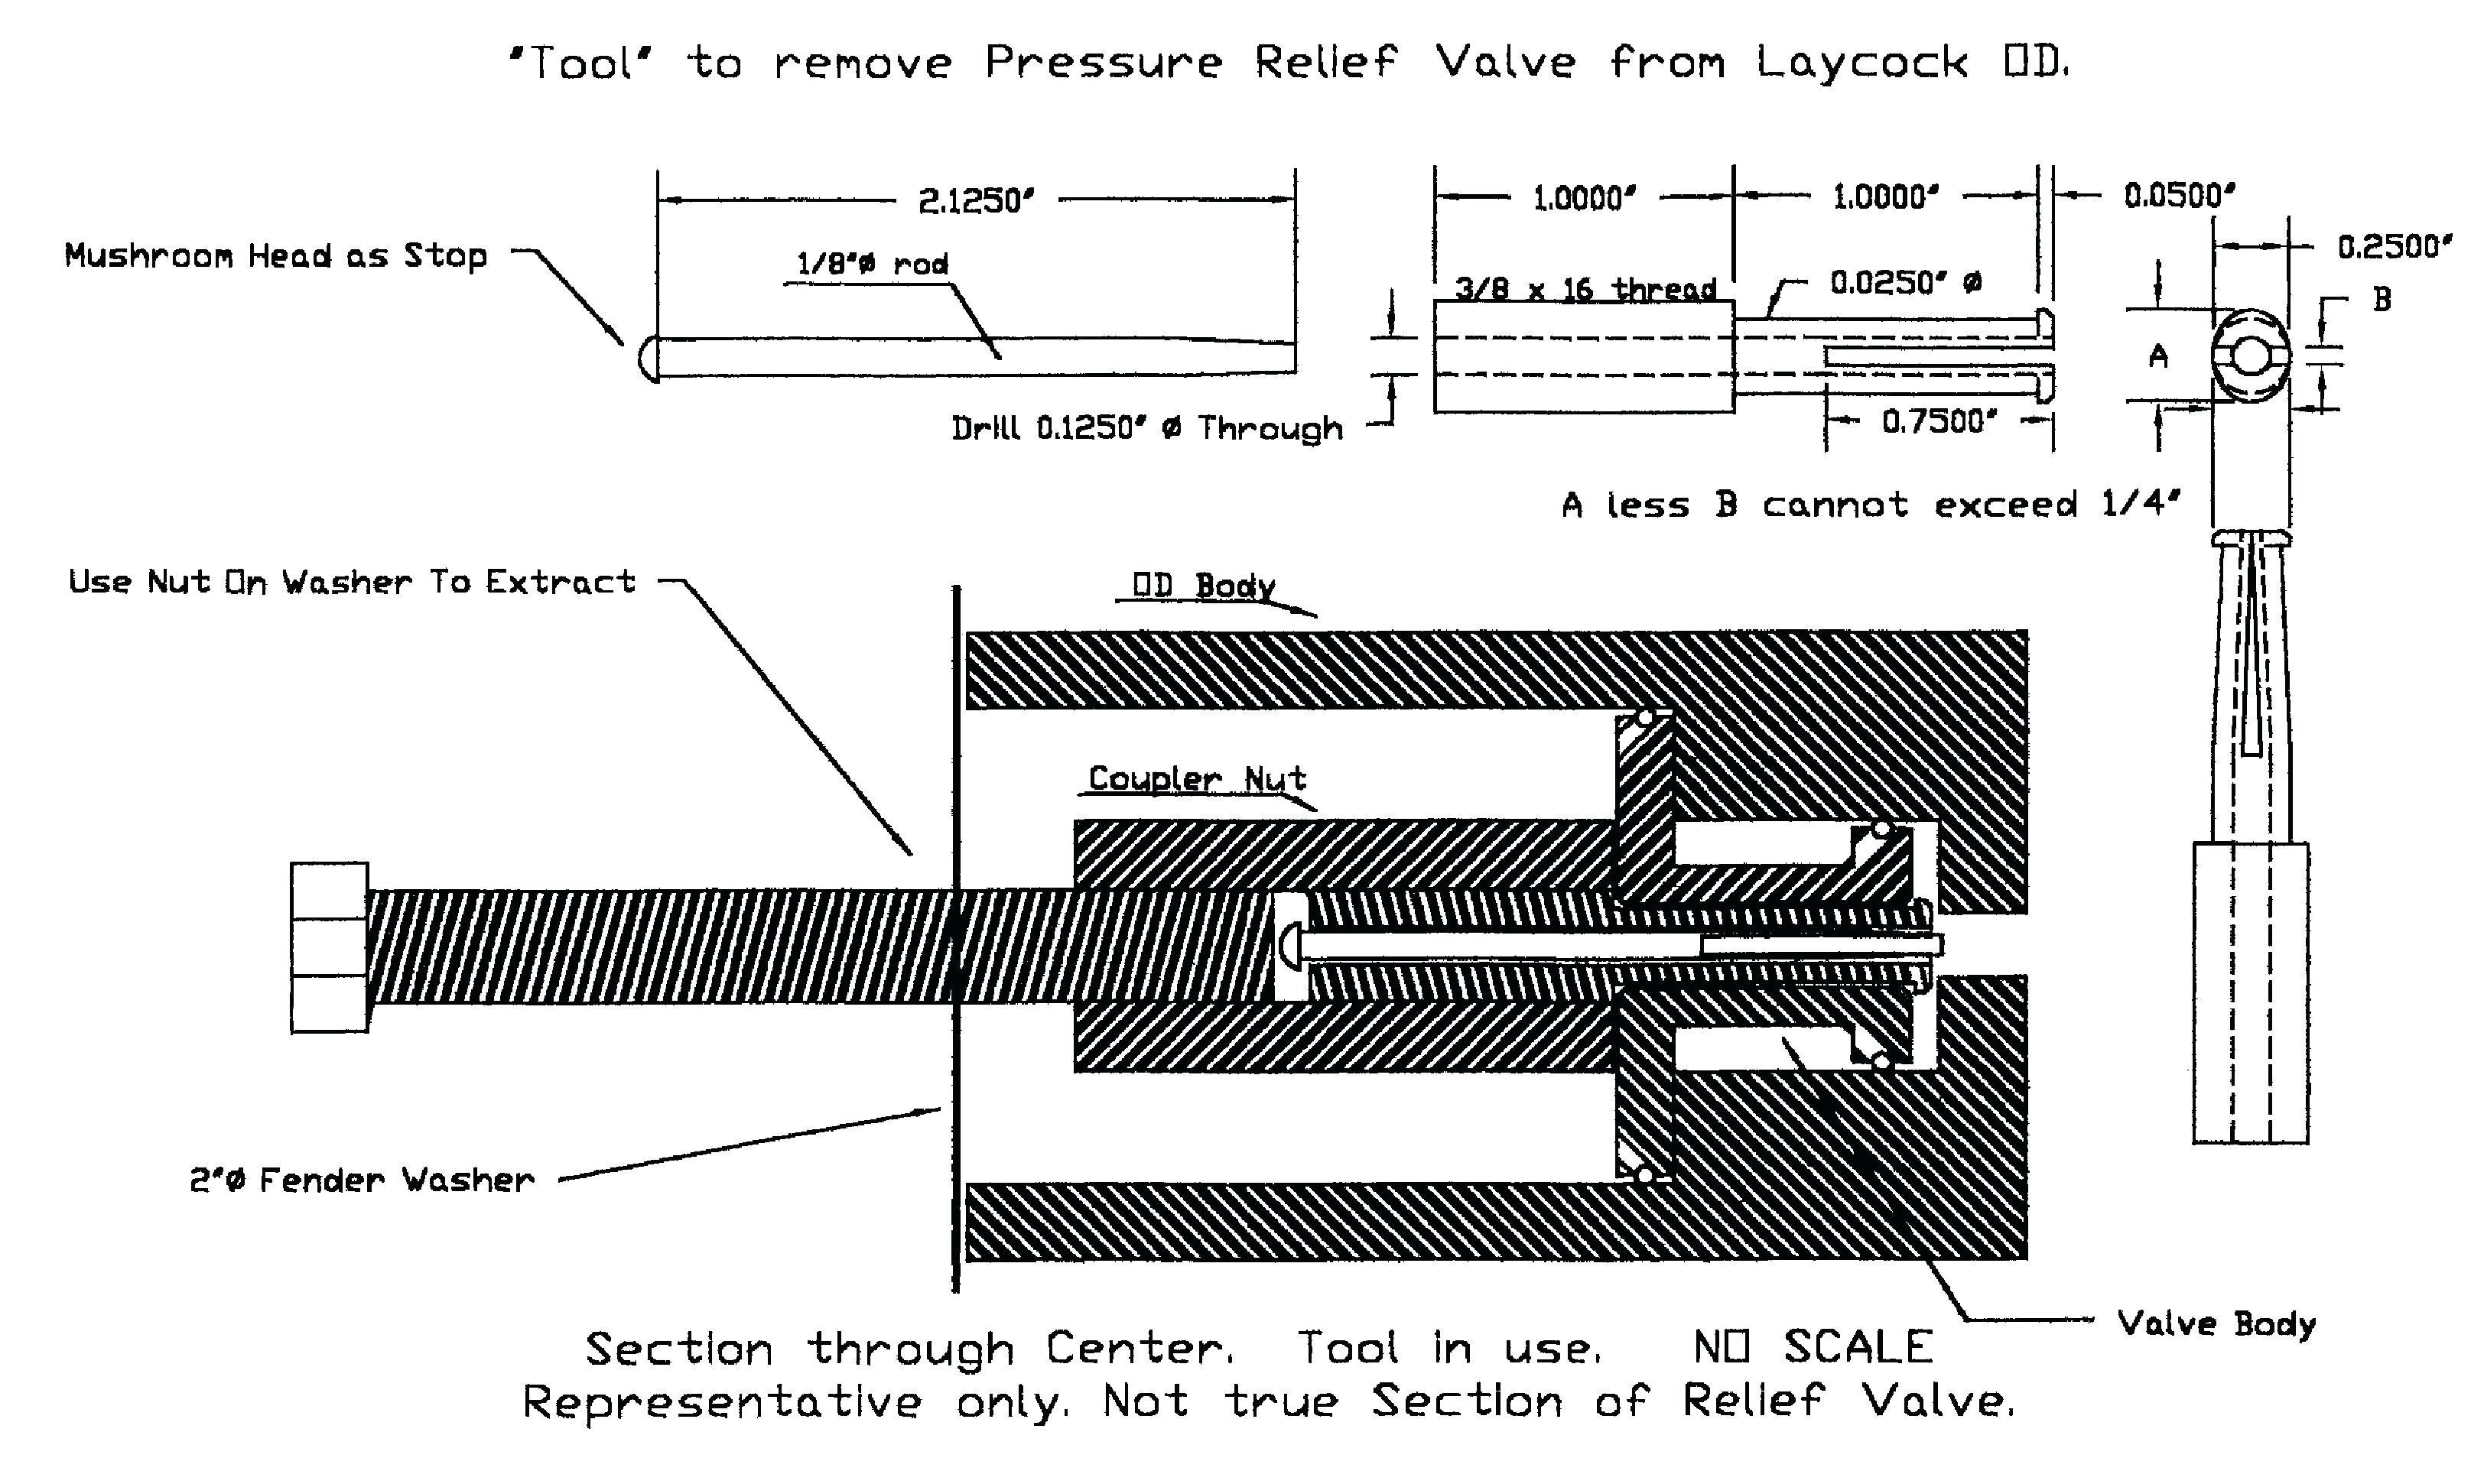 2002 Subaru Wrx Engine Diagram 2004 Subaru forester Radio Wiring Diagram Schematics Data Wiring Of 2002 Subaru Wrx Engine Diagram